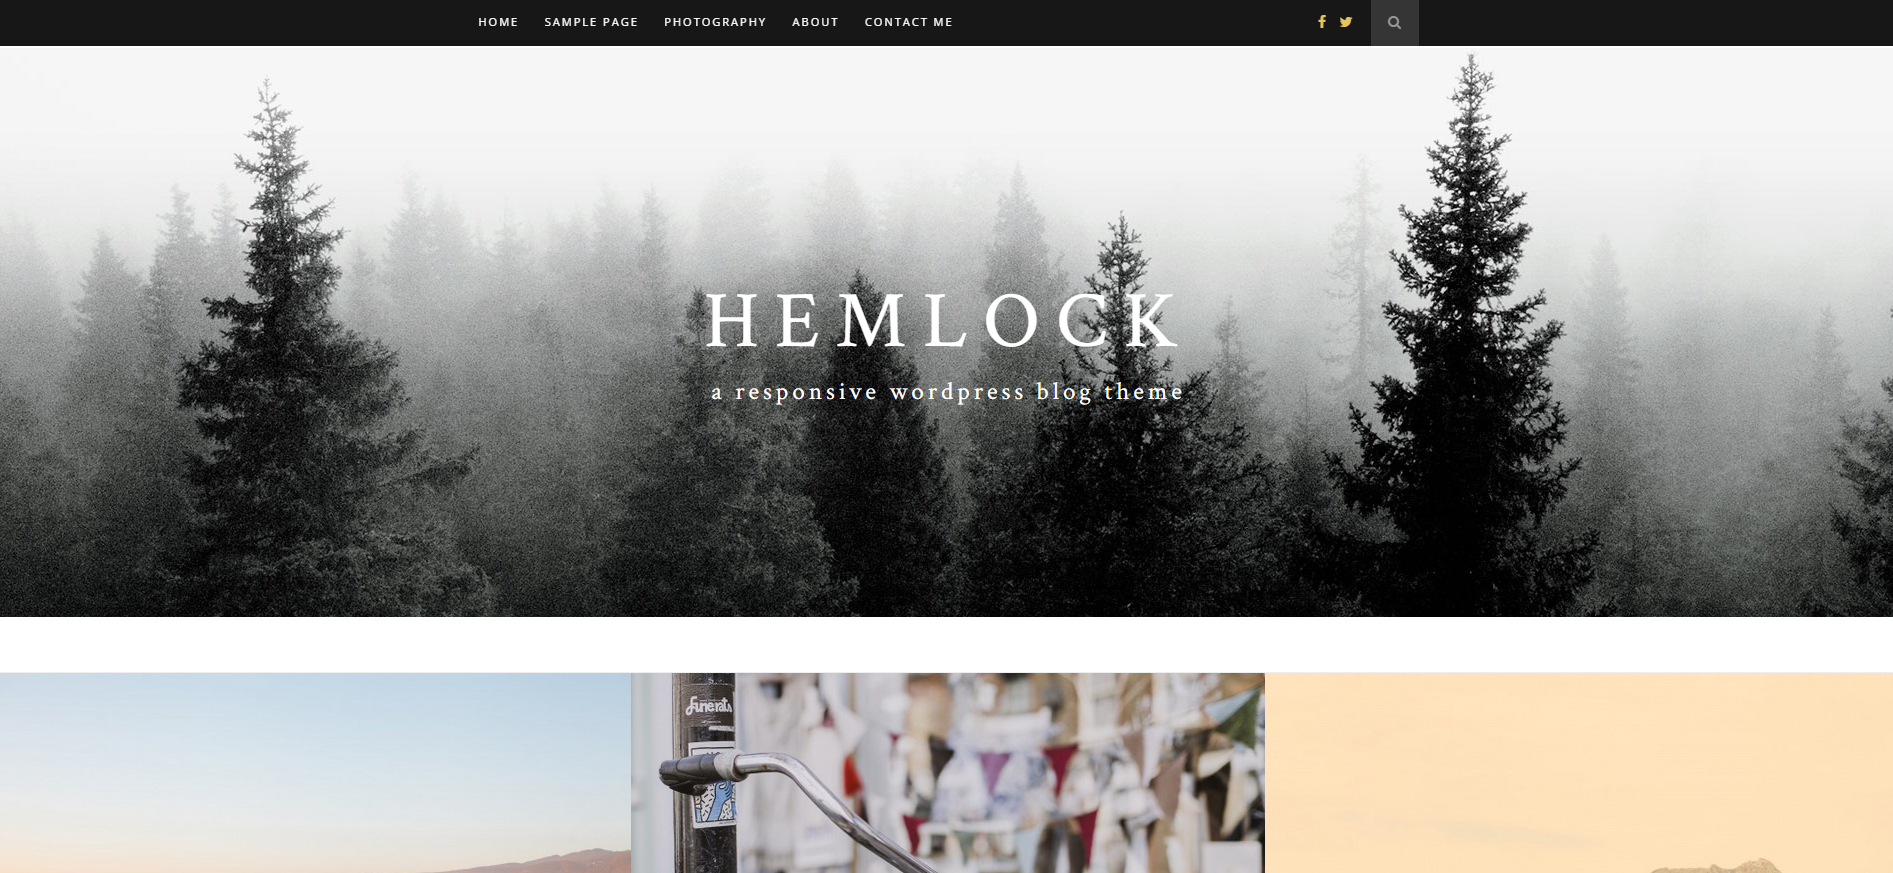 Make Hemlock S Logo Area Full Width Solo Pine